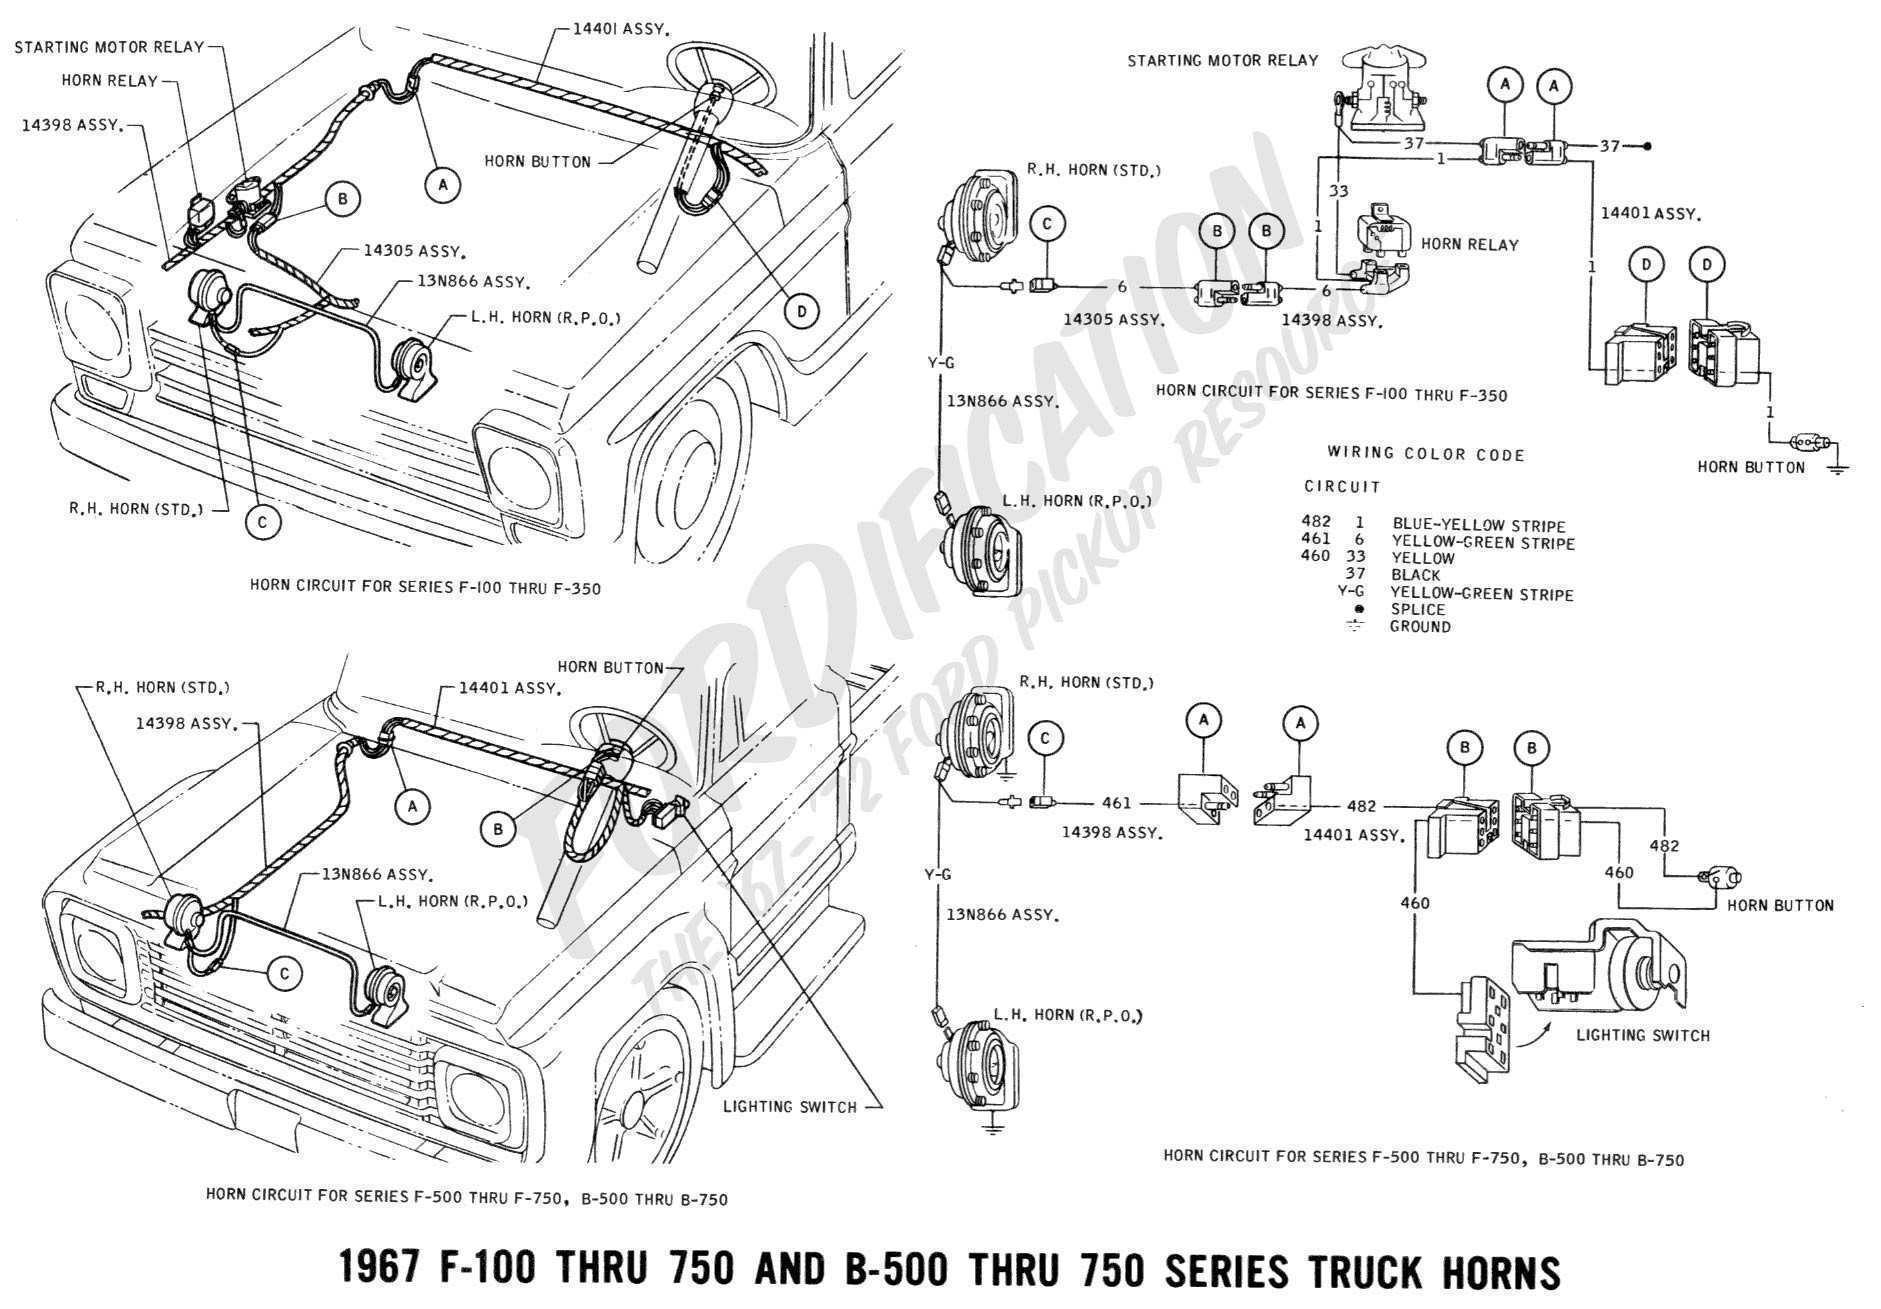 Groovy Ford Starter Solenoid Wiring Diagram Wirings Diagram Wiring 101 Mecadwellnesstrialsorg